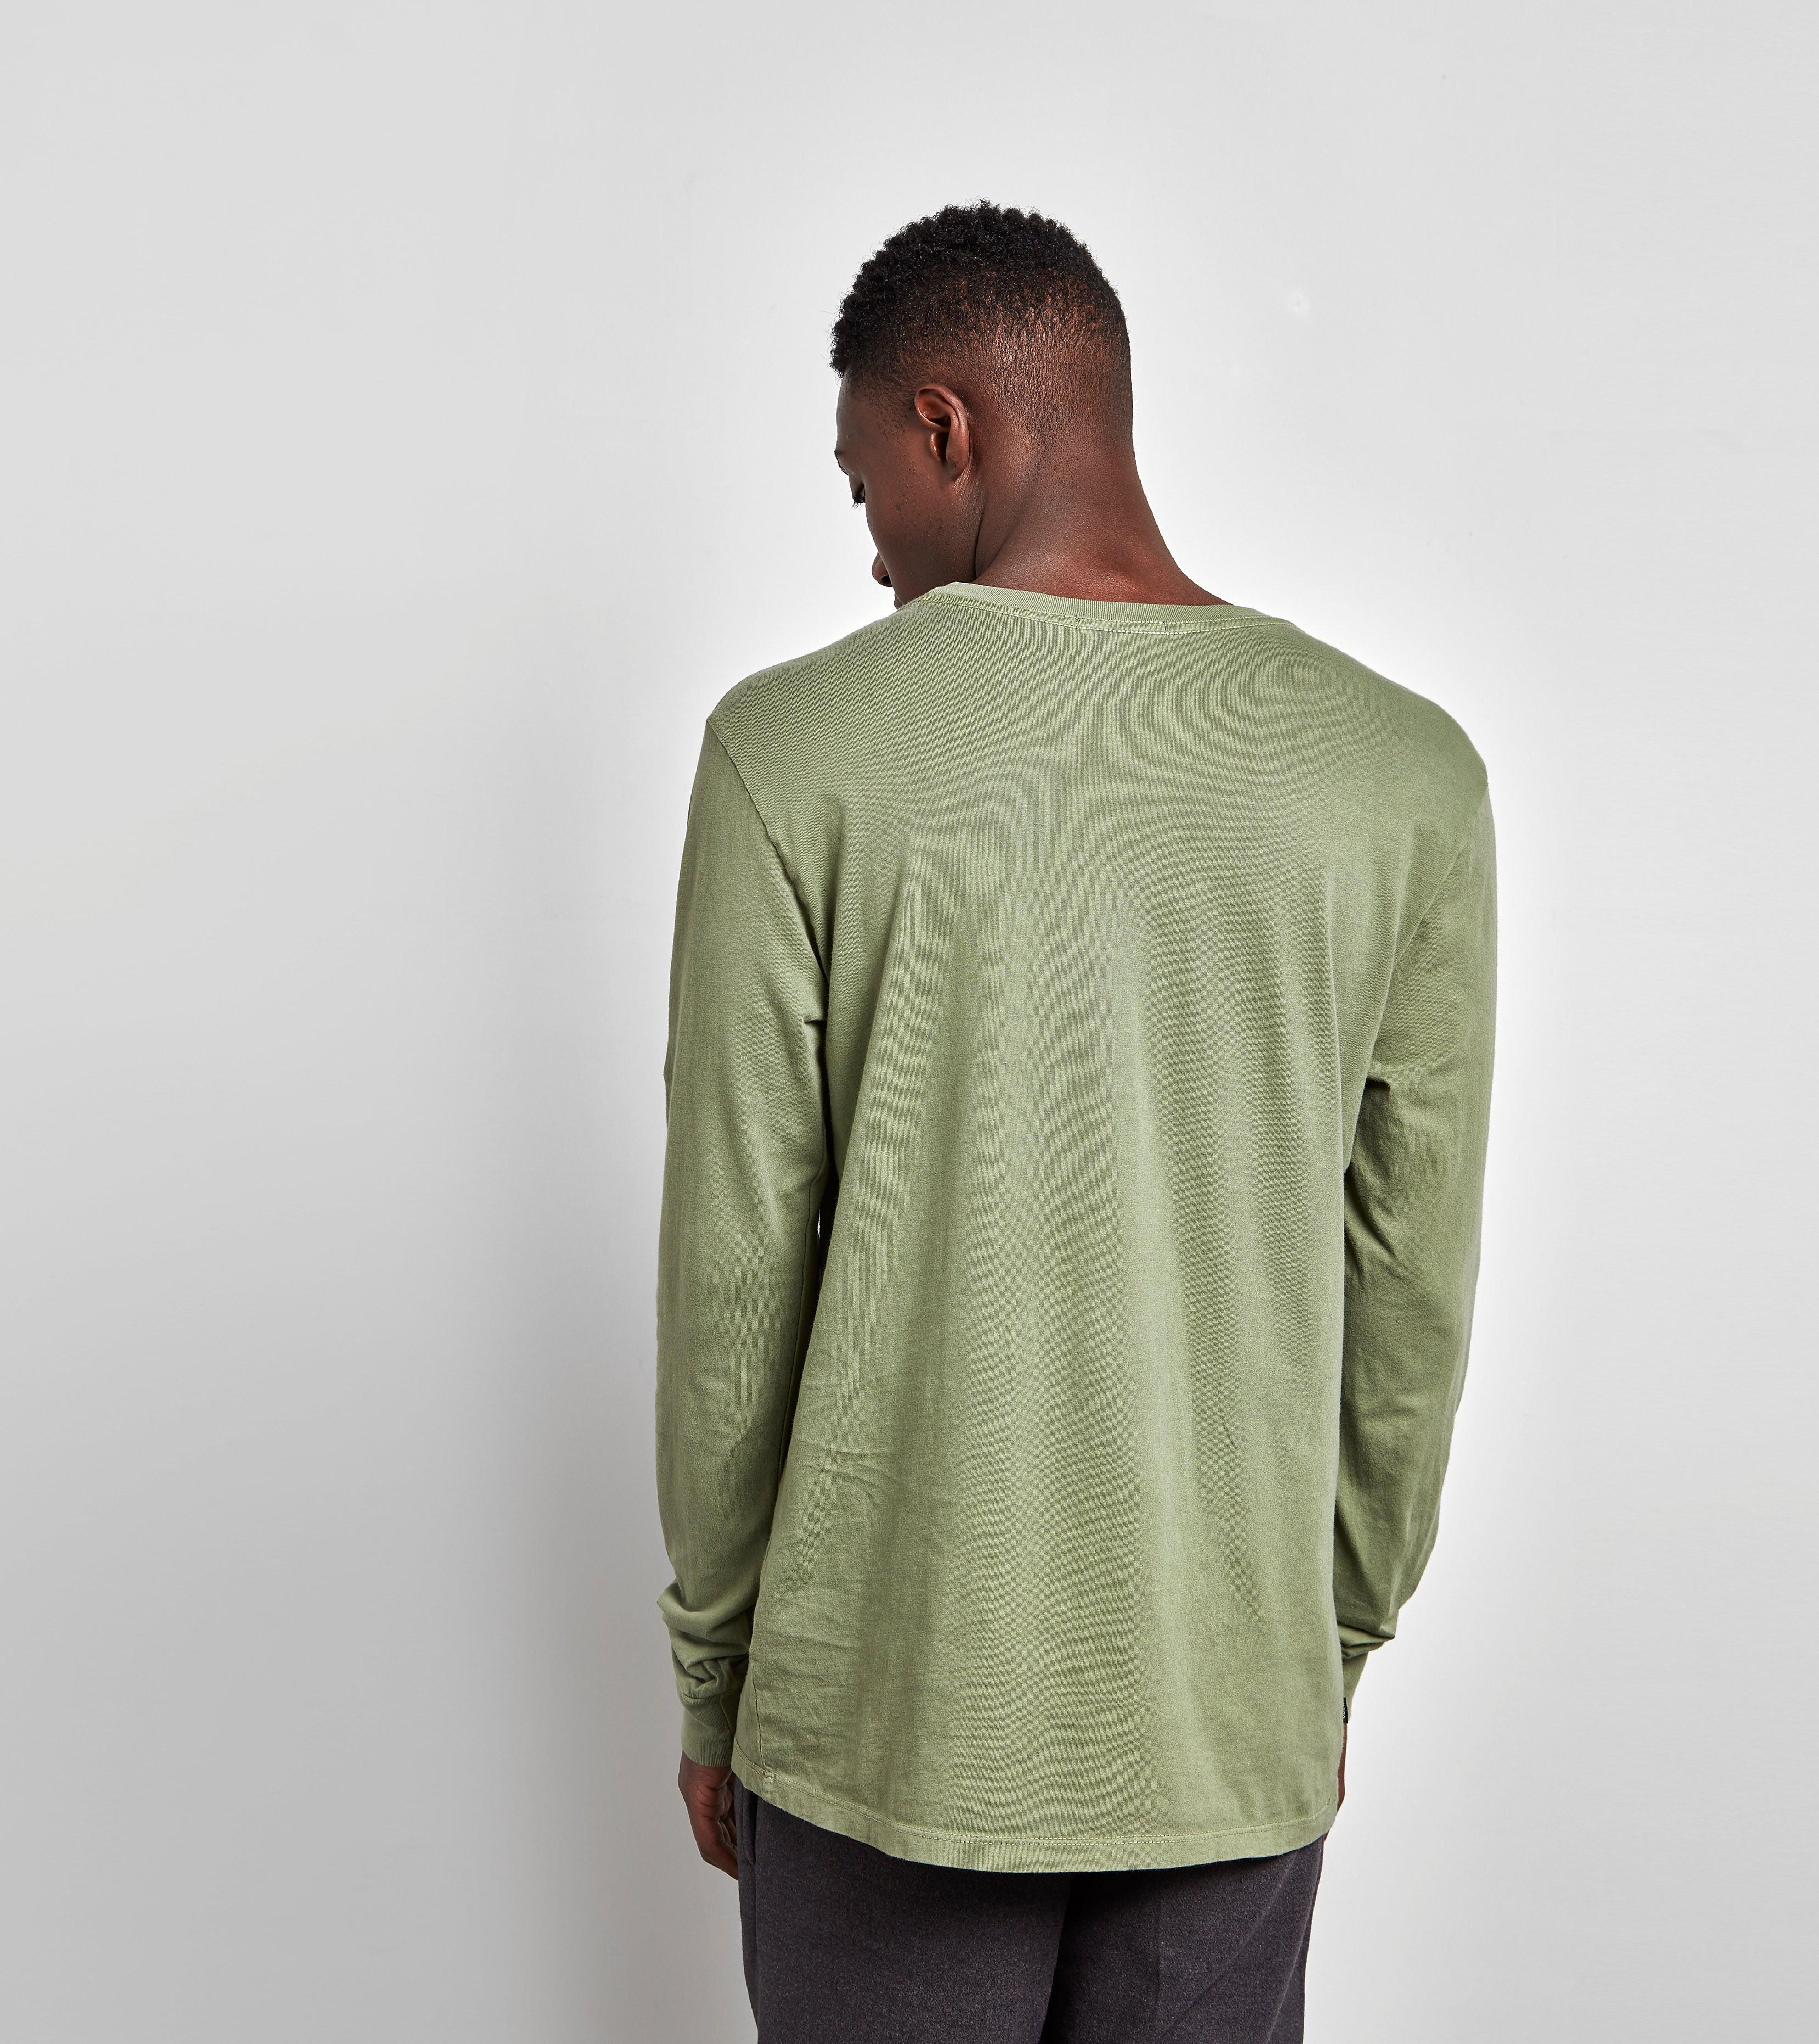 Obey Long-Sleeved Destruct Bloom T-Shirt